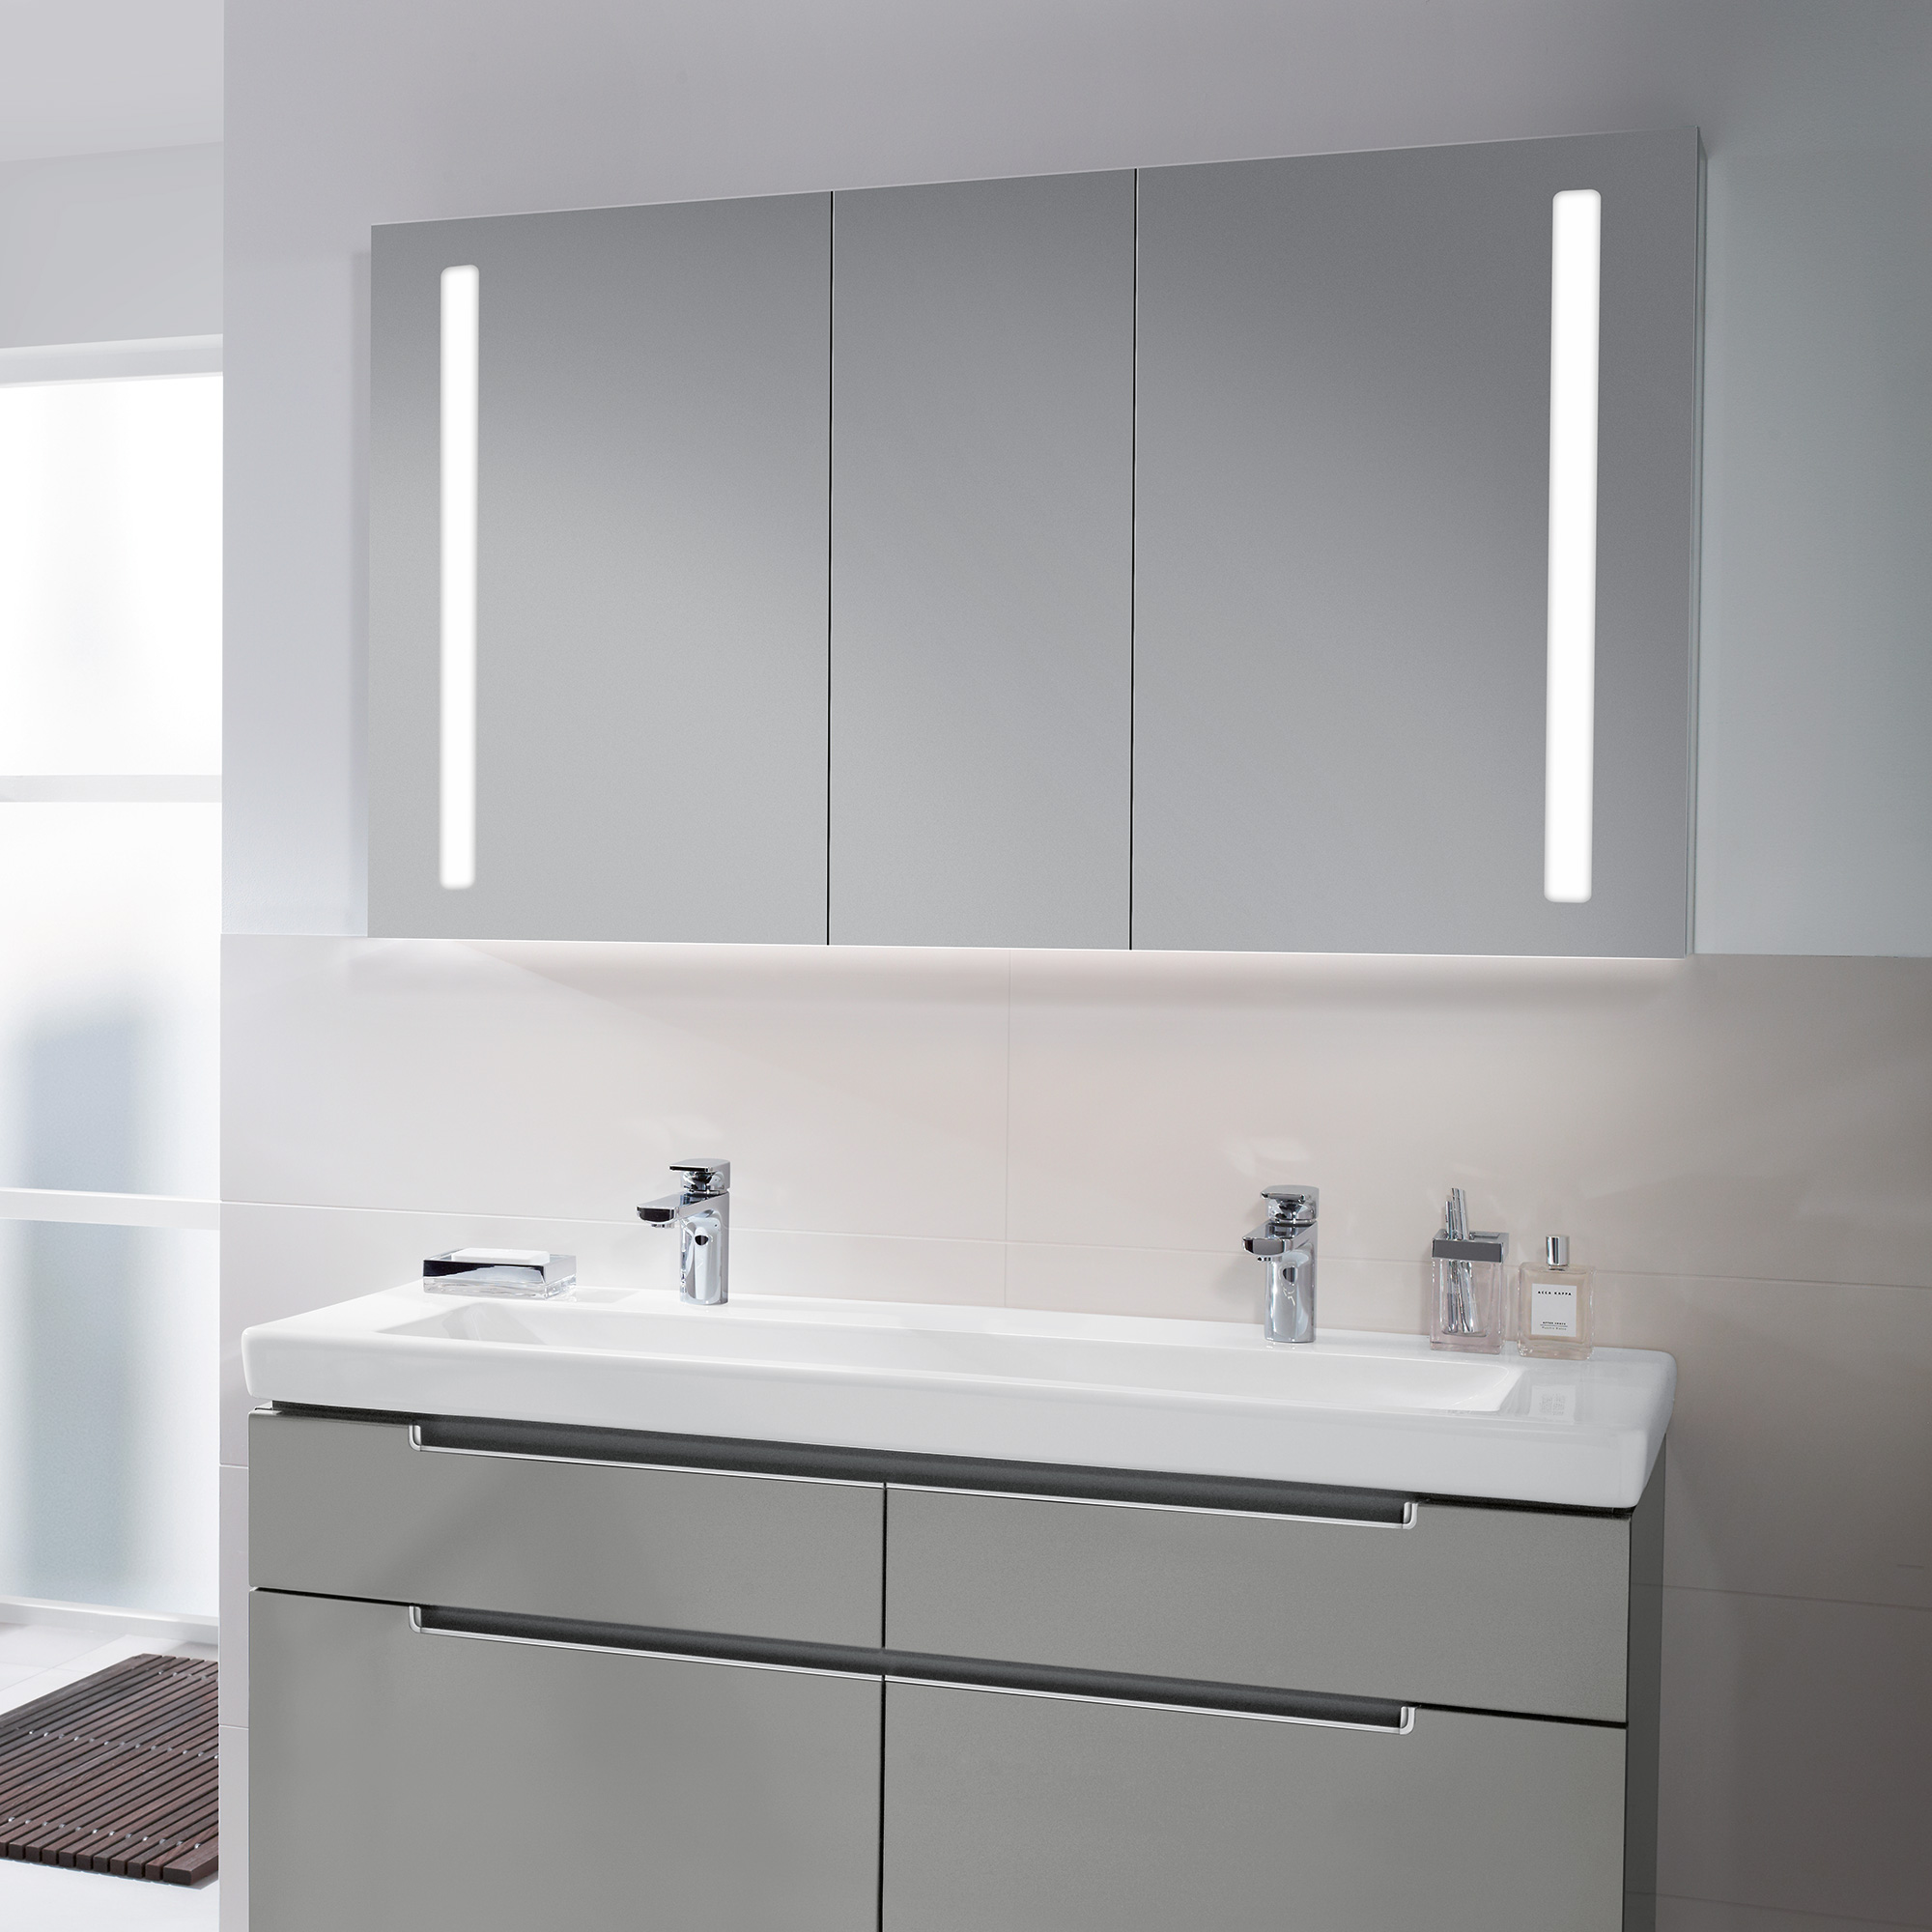 Villeroy boch my view 14 plus spiegelschrank mit led for Villeroy et boch salle de bain showroom